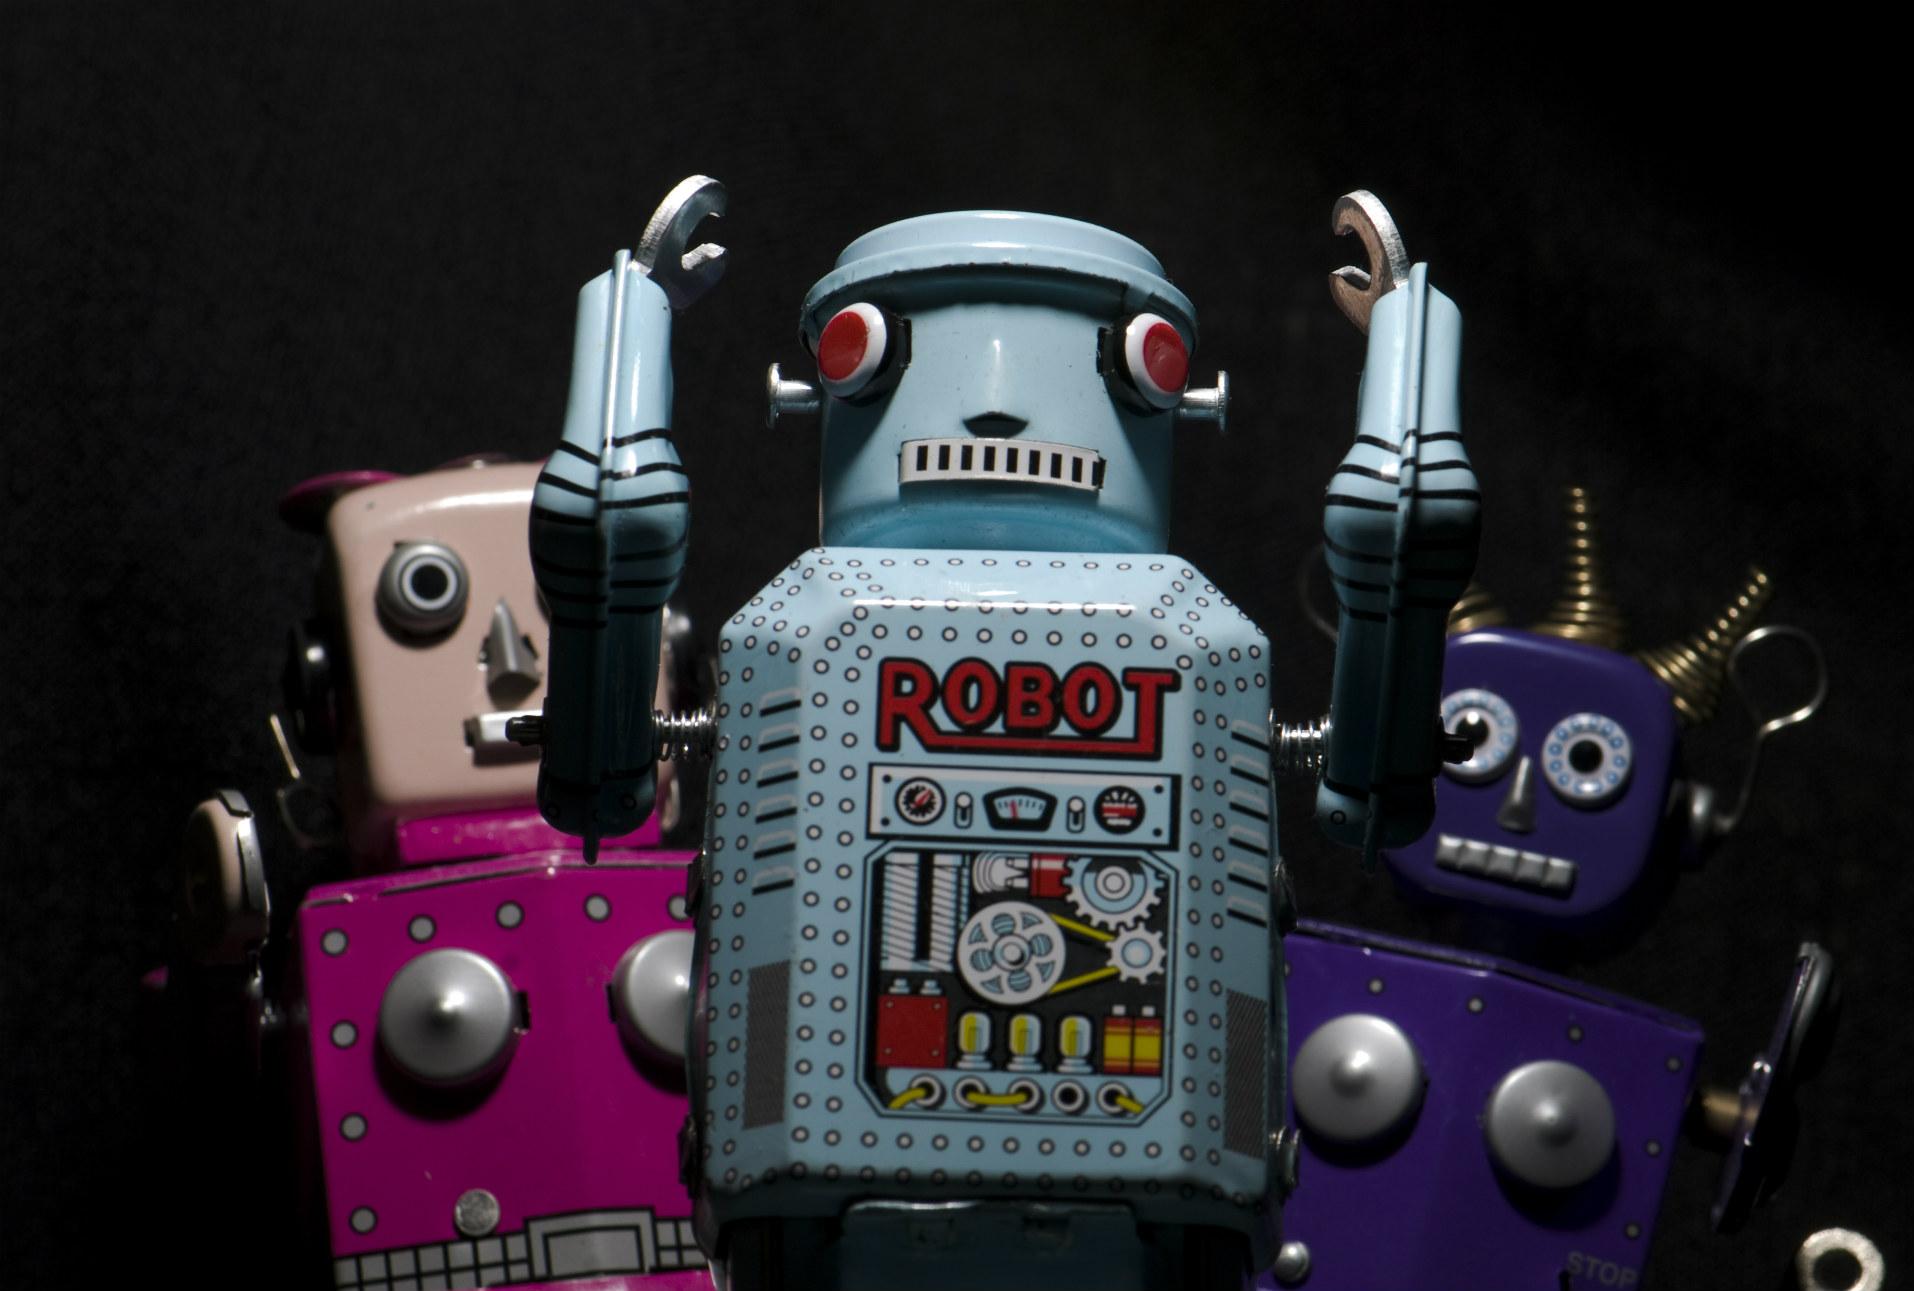 Twitter permitirá a usuarios denunciar bots